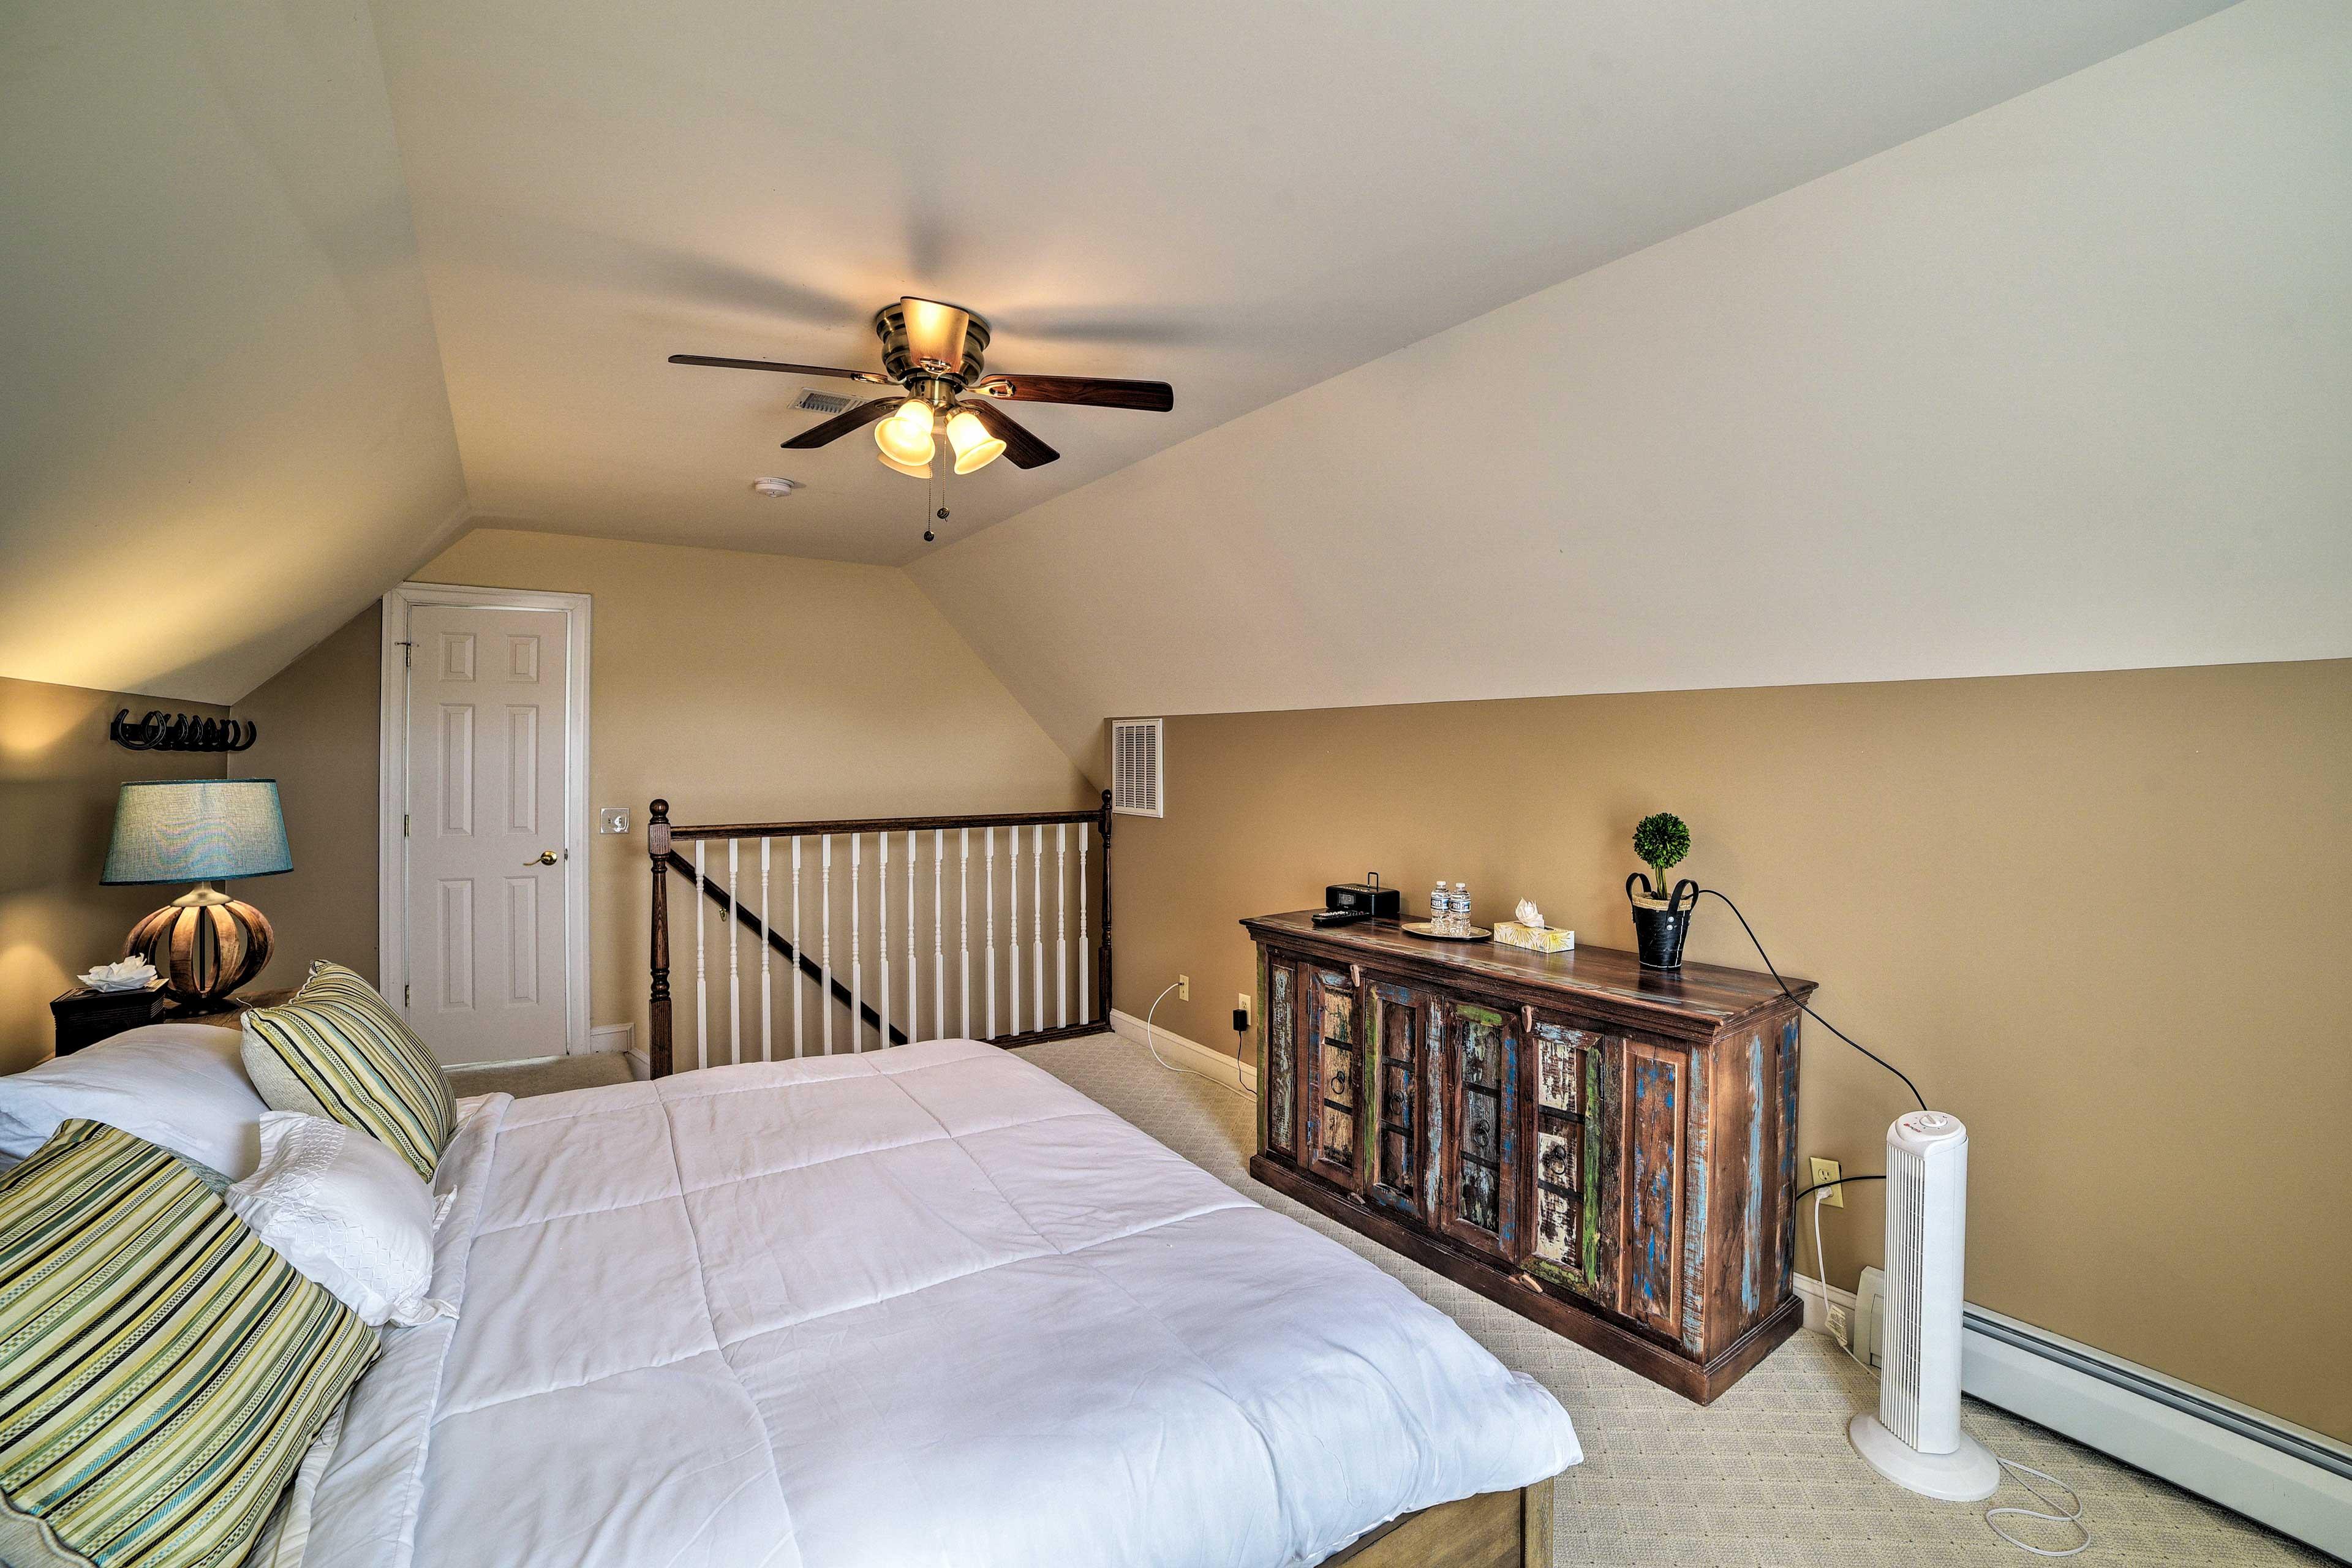 Bedroom 4 | Loft | King Bed